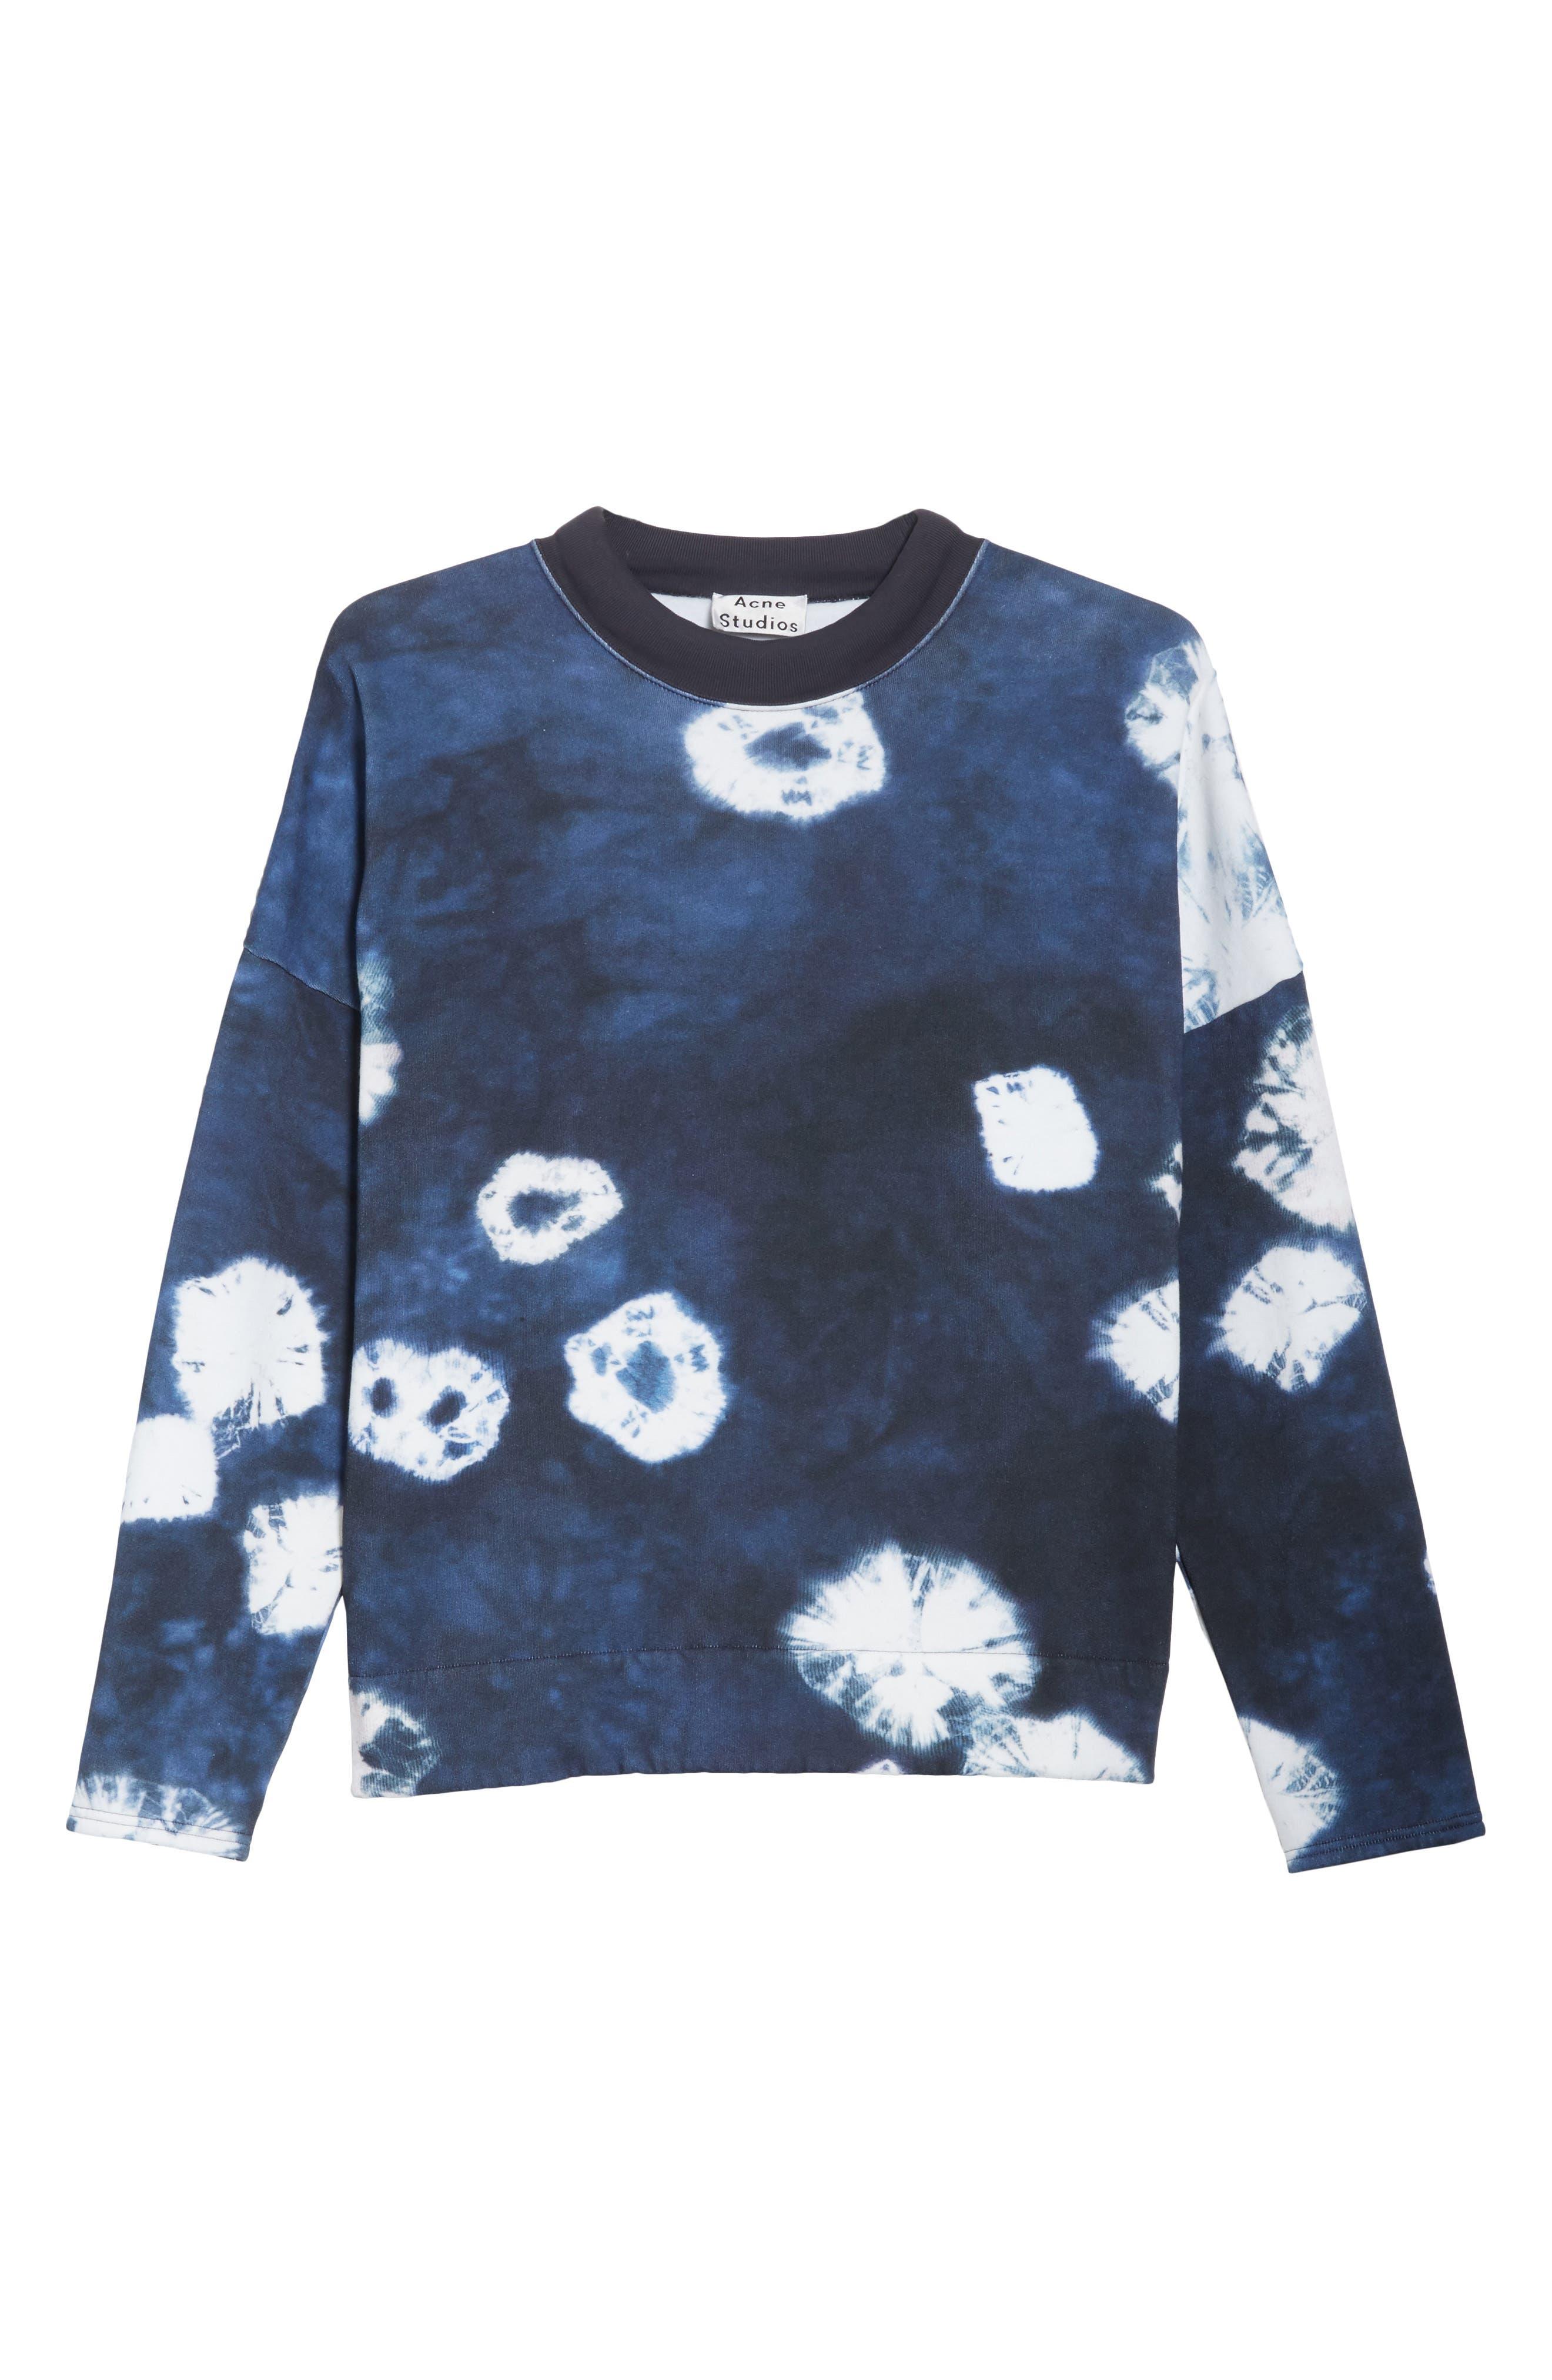 Fellke Bleach Indigo Sweatshirt,                             Alternate thumbnail 6, color,                             410